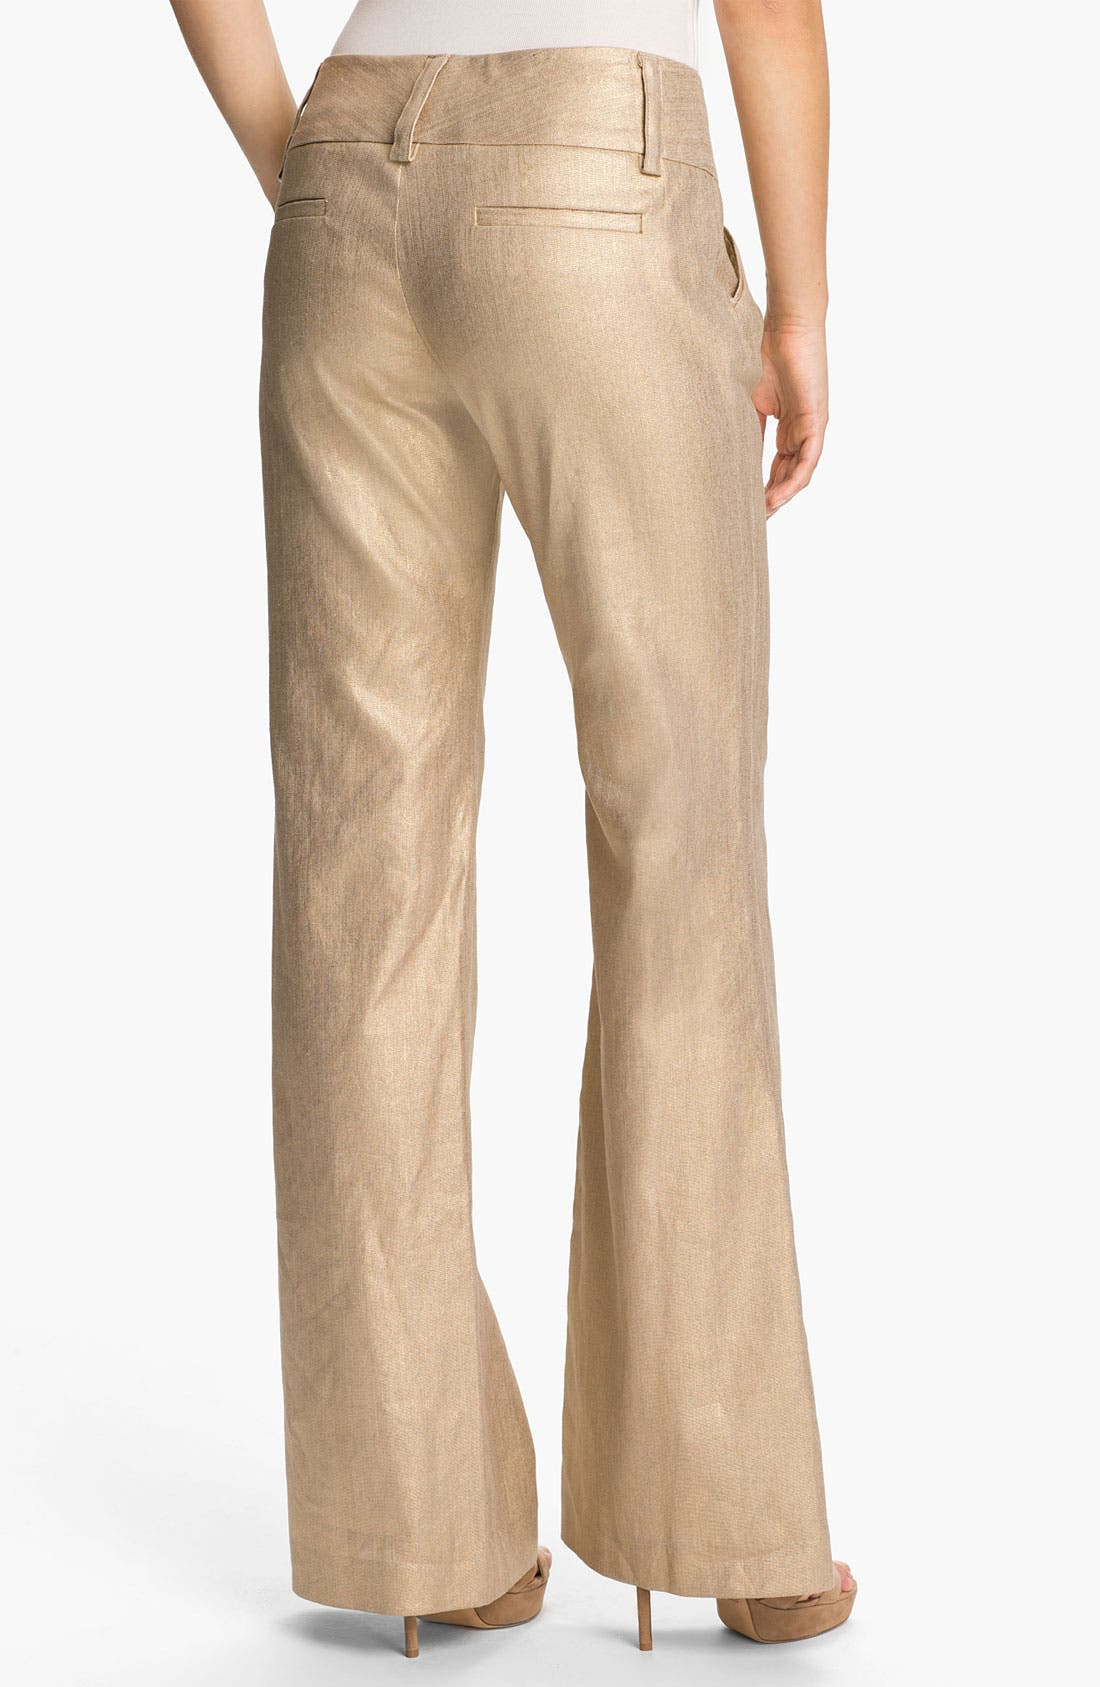 'Olivia' Wide Leg Stretch Pants,                             Alternate thumbnail 3, color,                             710